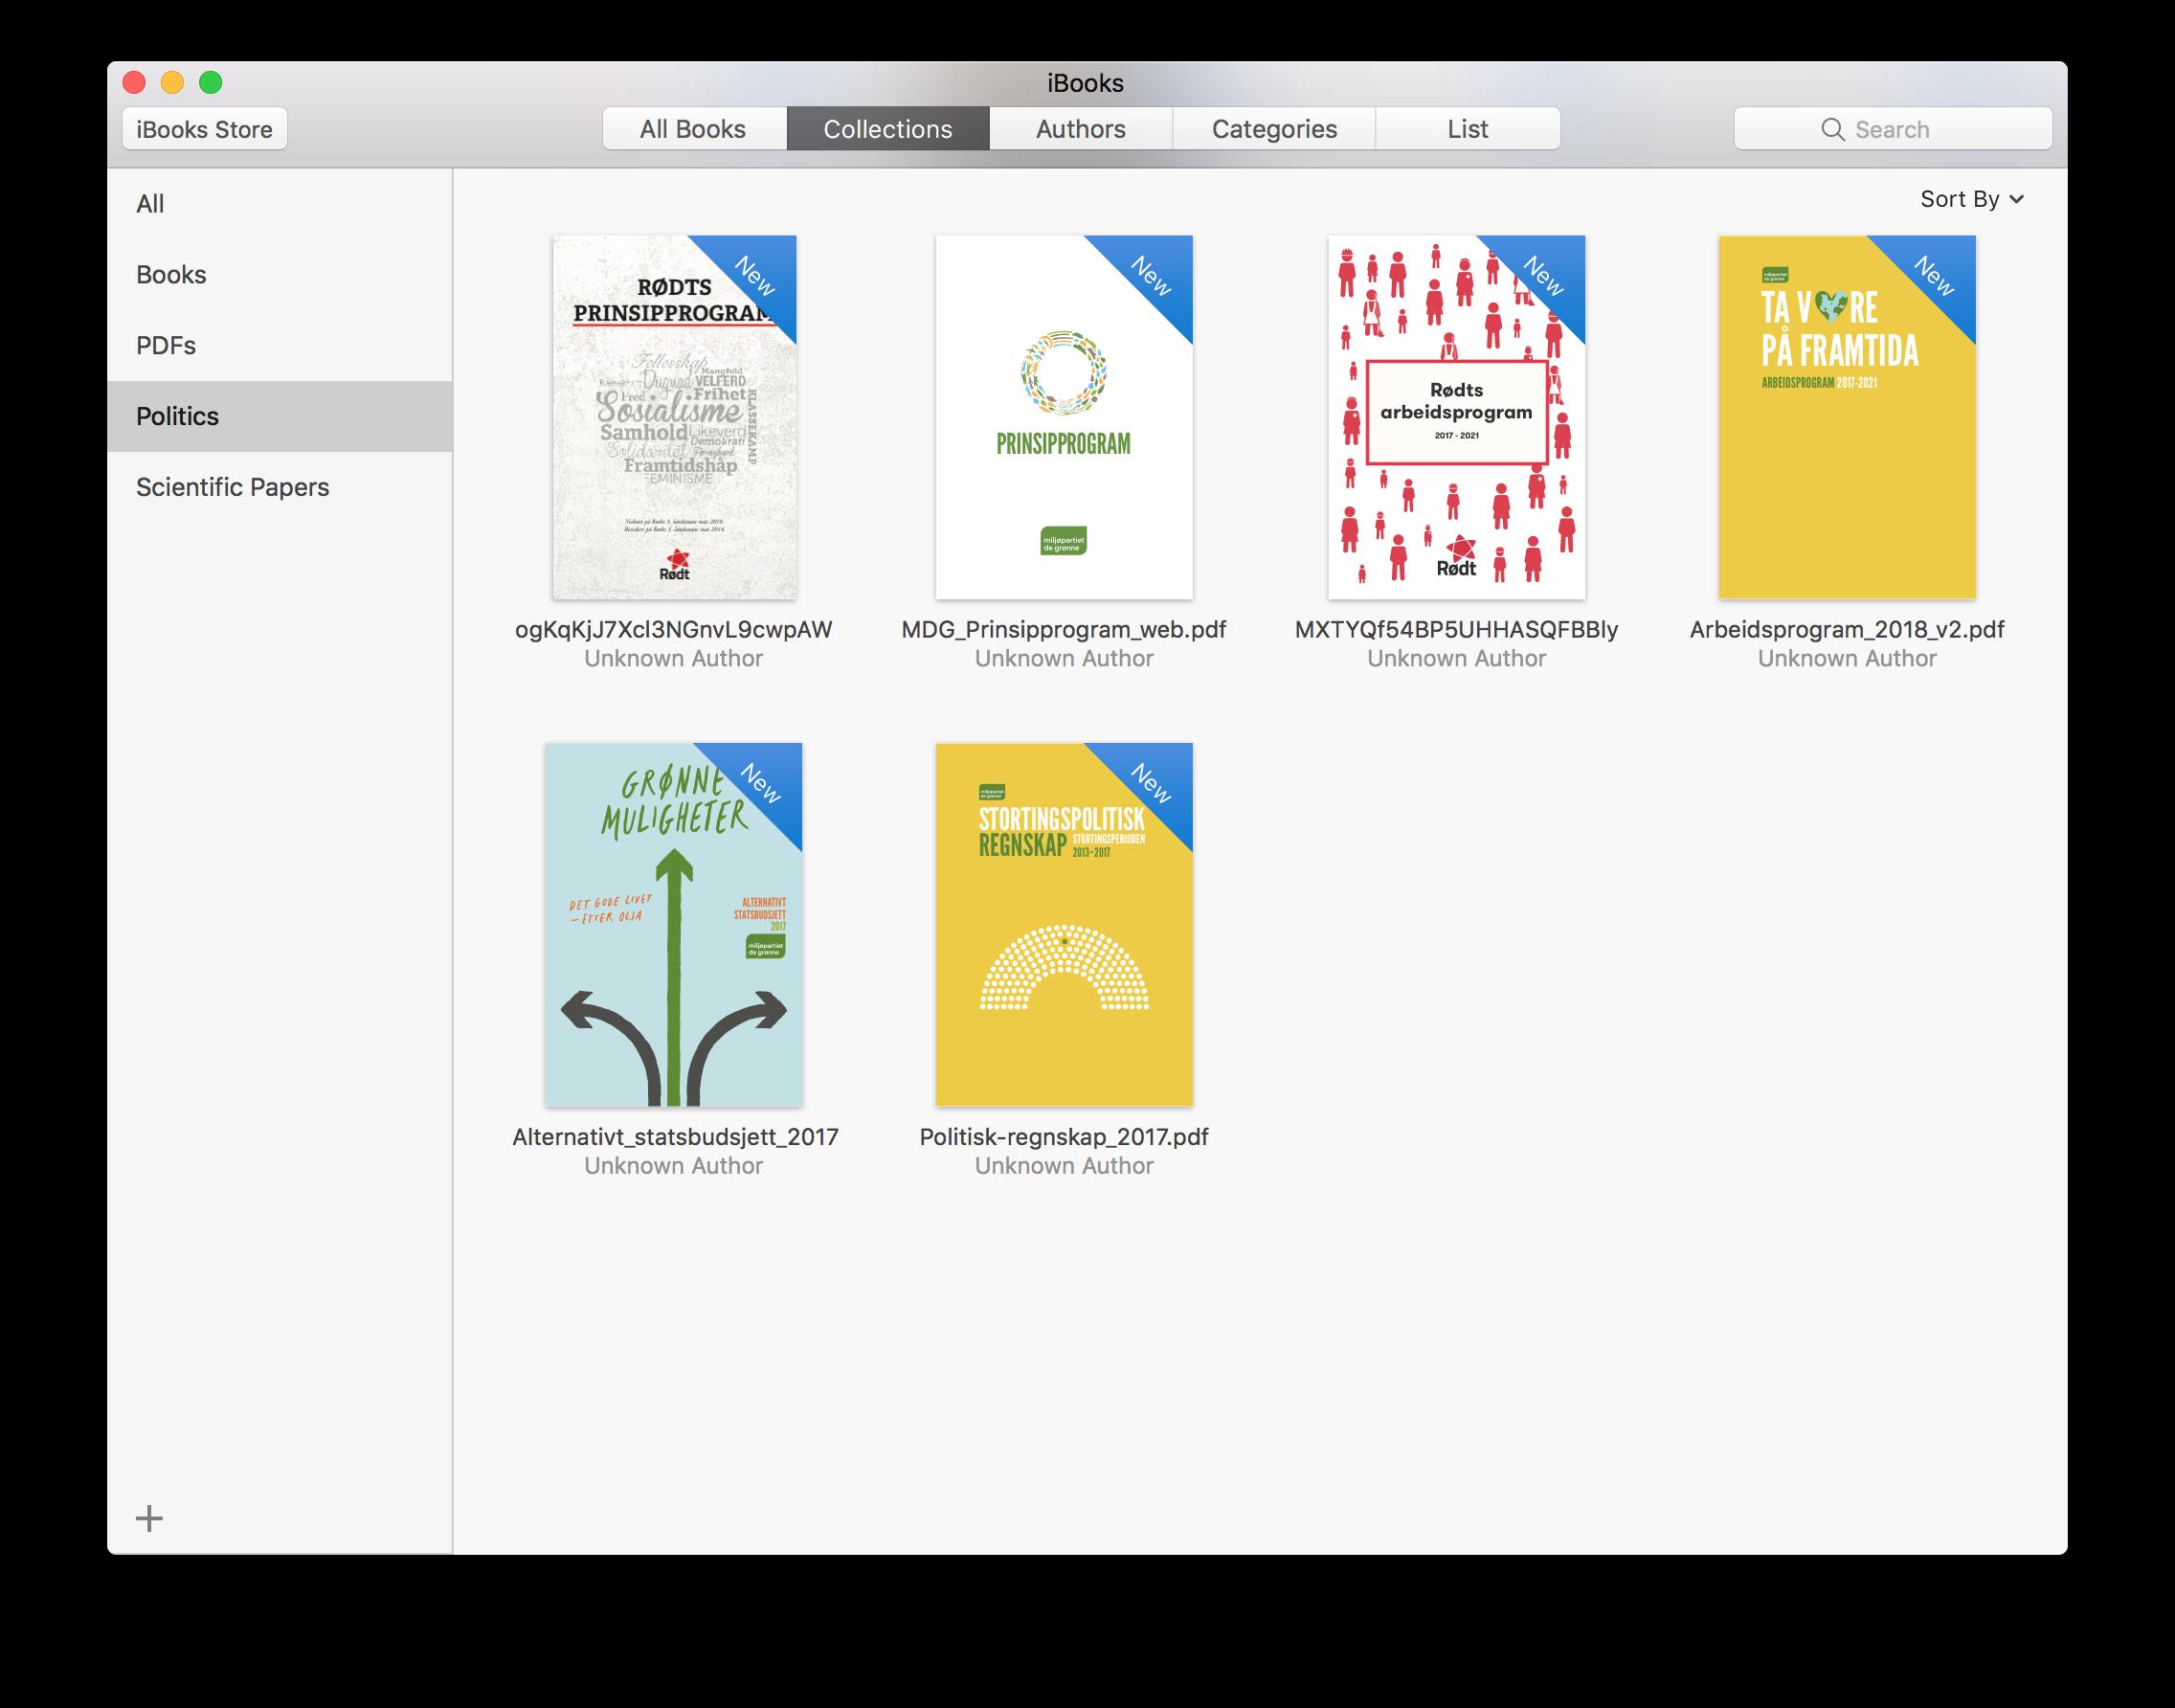 how do i add ebooks to my ipad